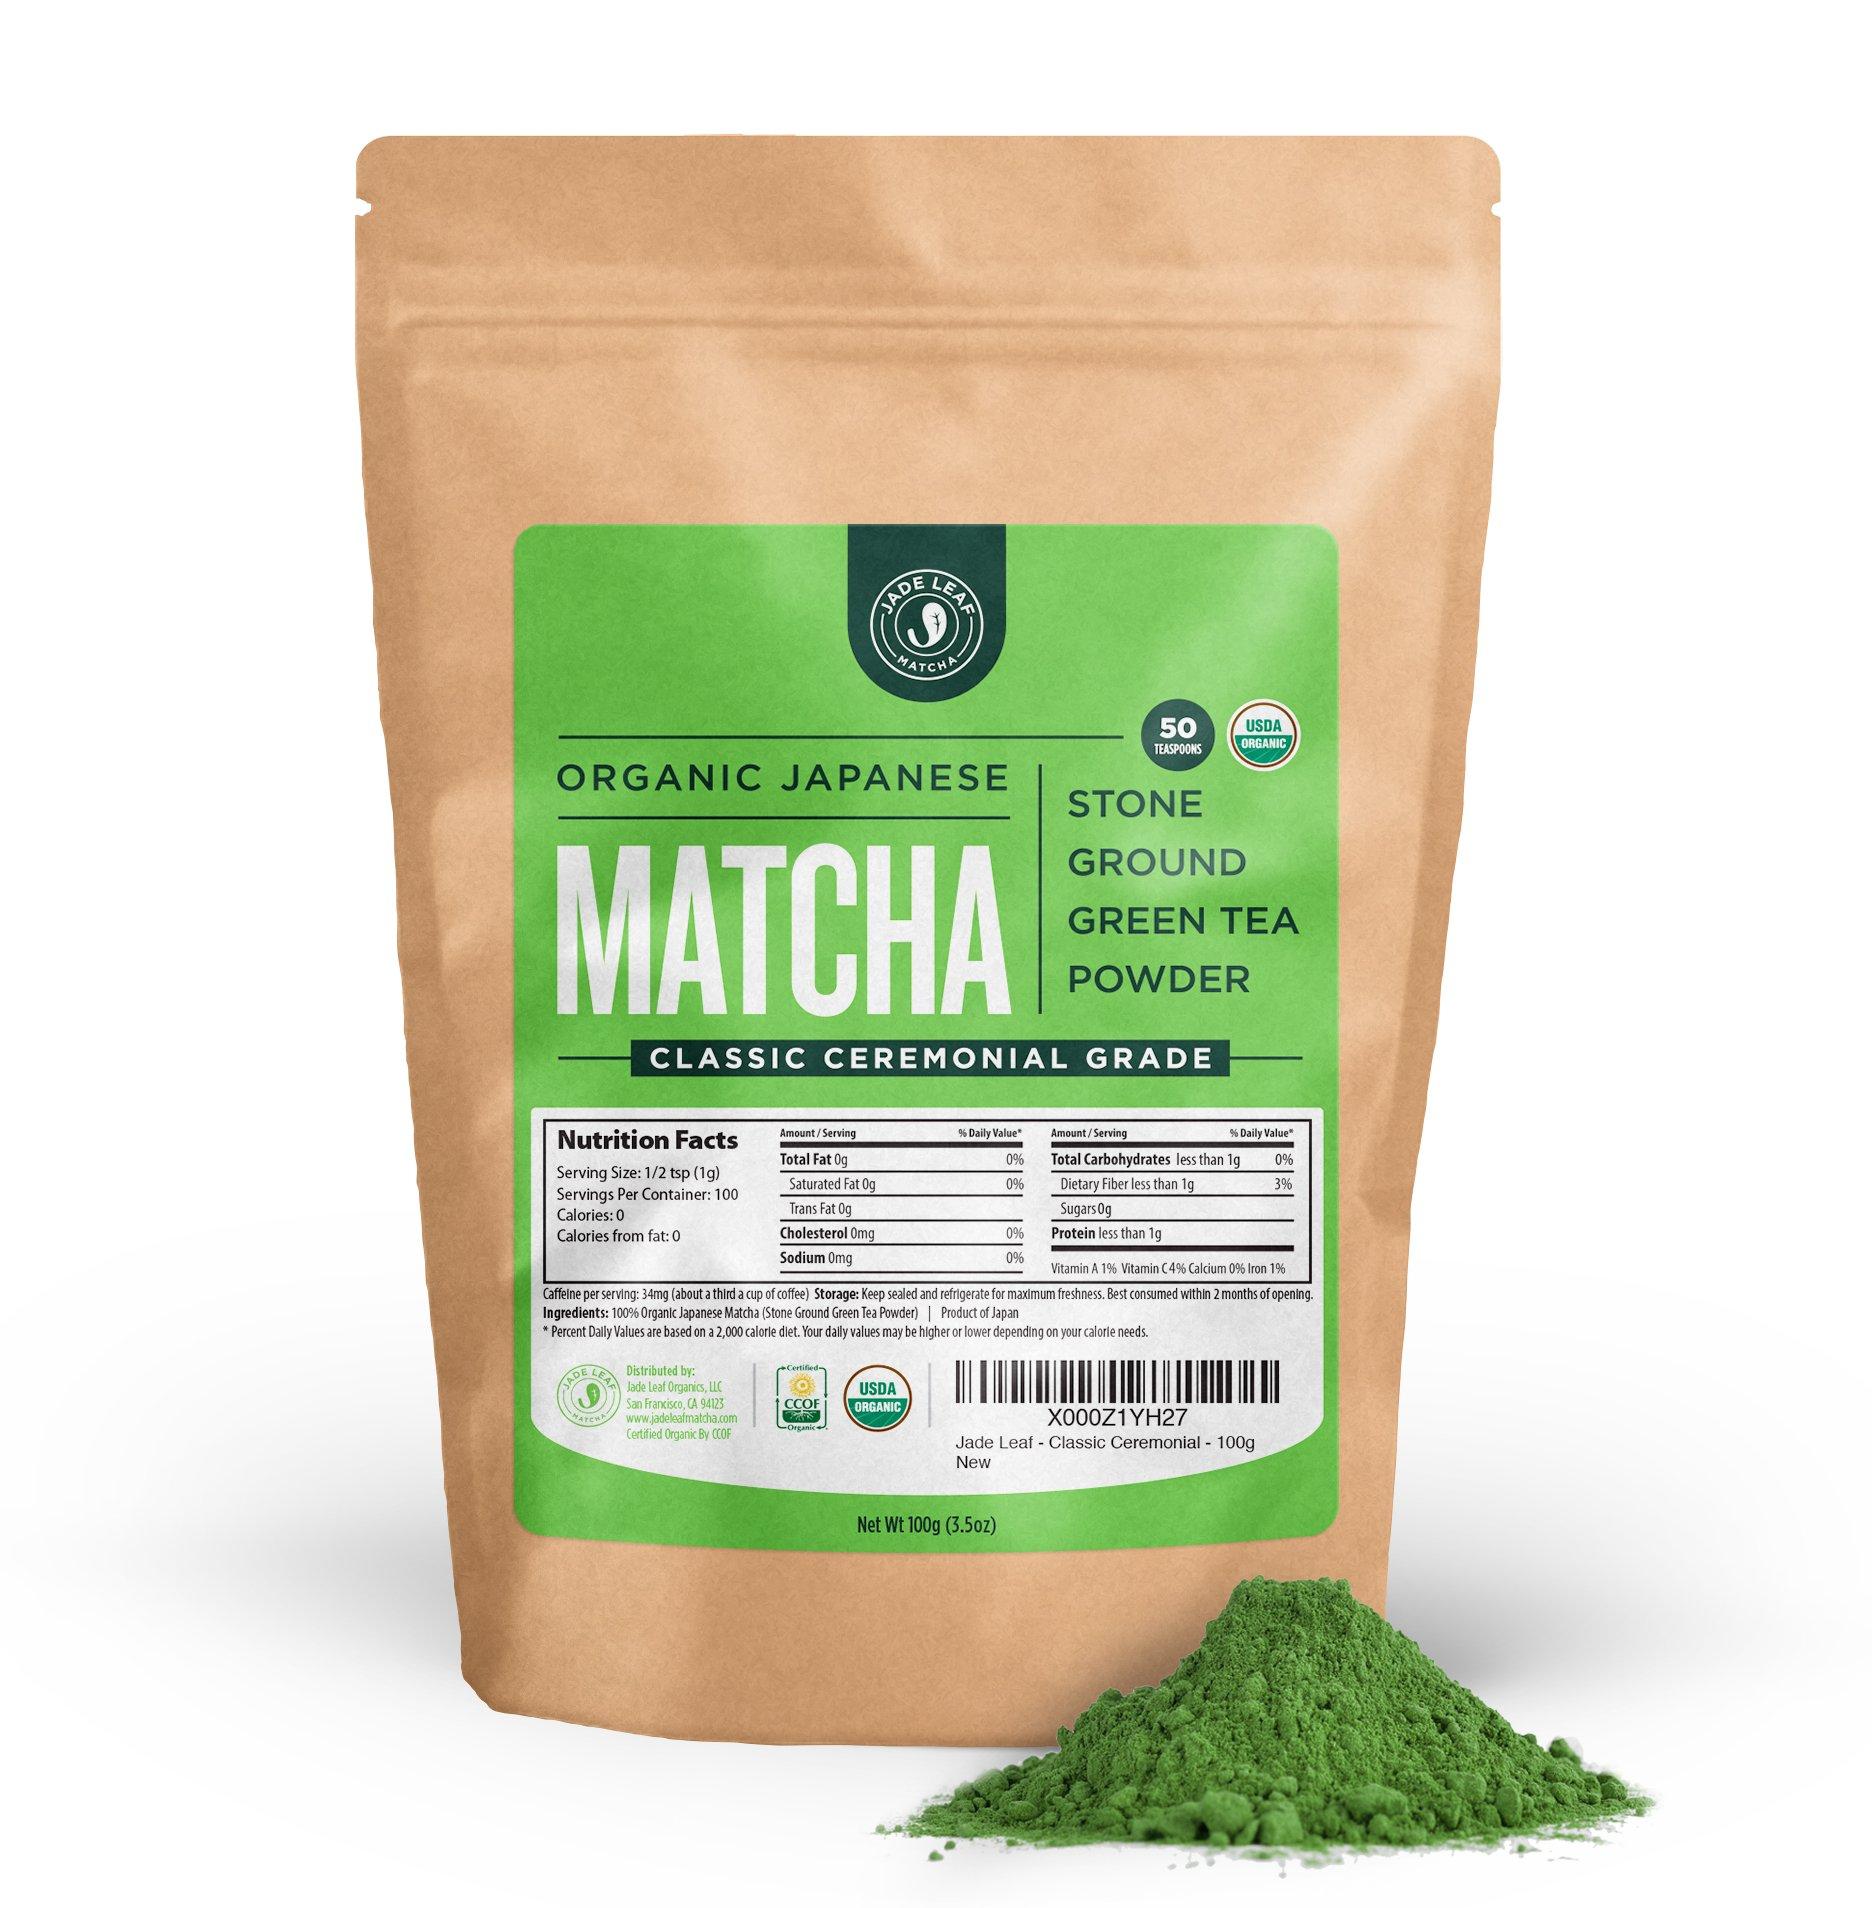 Jade Leaf Matcha Green Tea Powder - USDA Organic - Ceremonial Grade (For Sipping as Tea) - Authentic Japanese Origin - Antioxidants, Energy [100g Value Size]